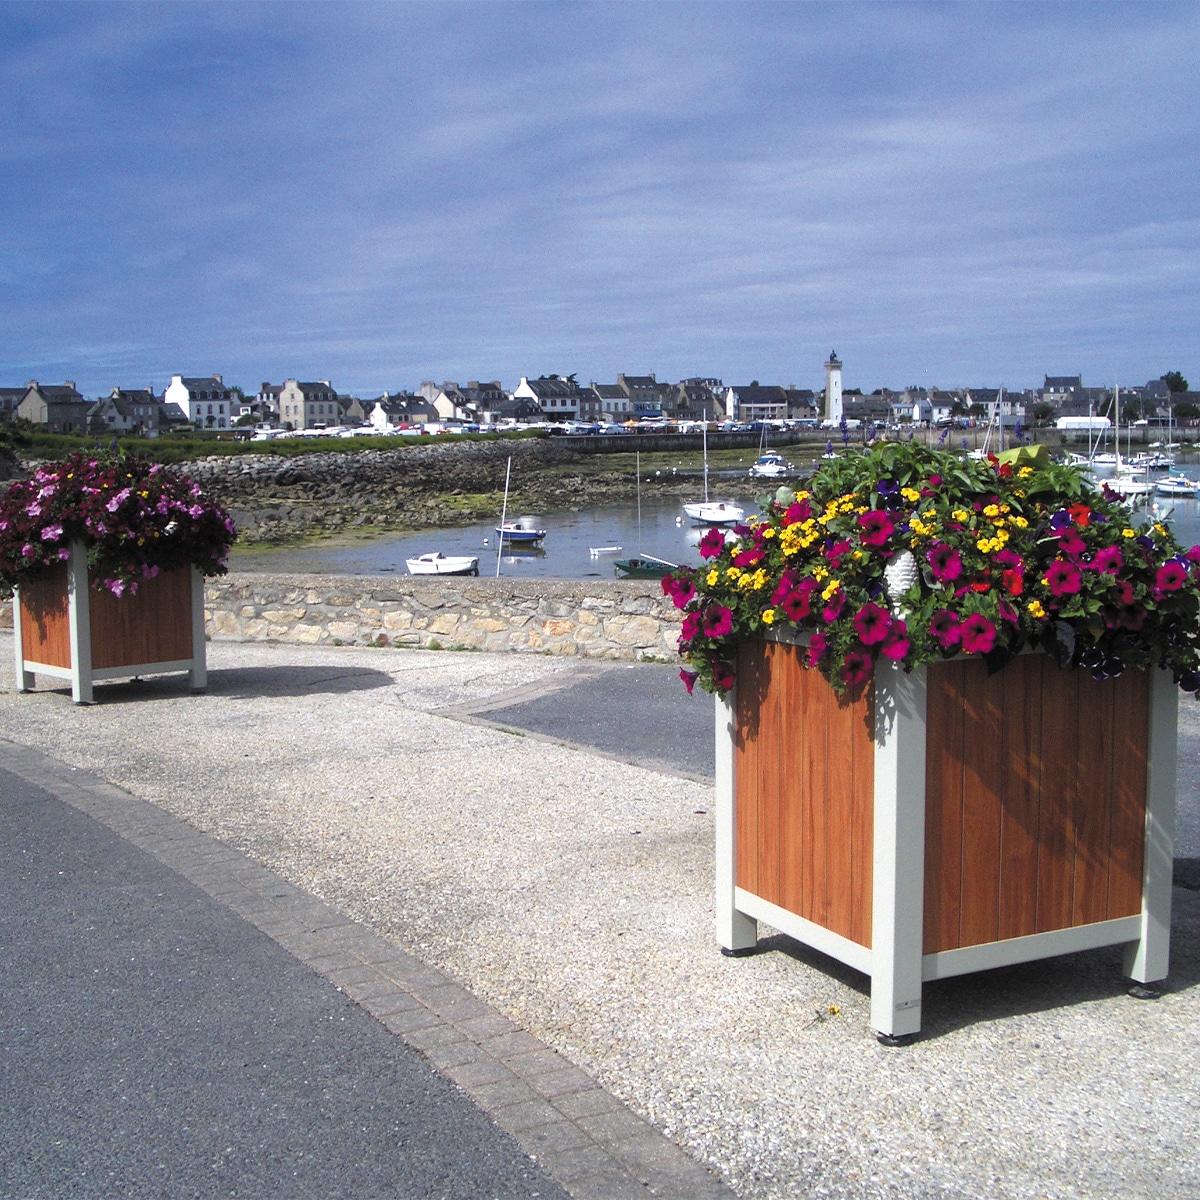 ATECH-bank-design-planter-flower-city-dualis-range